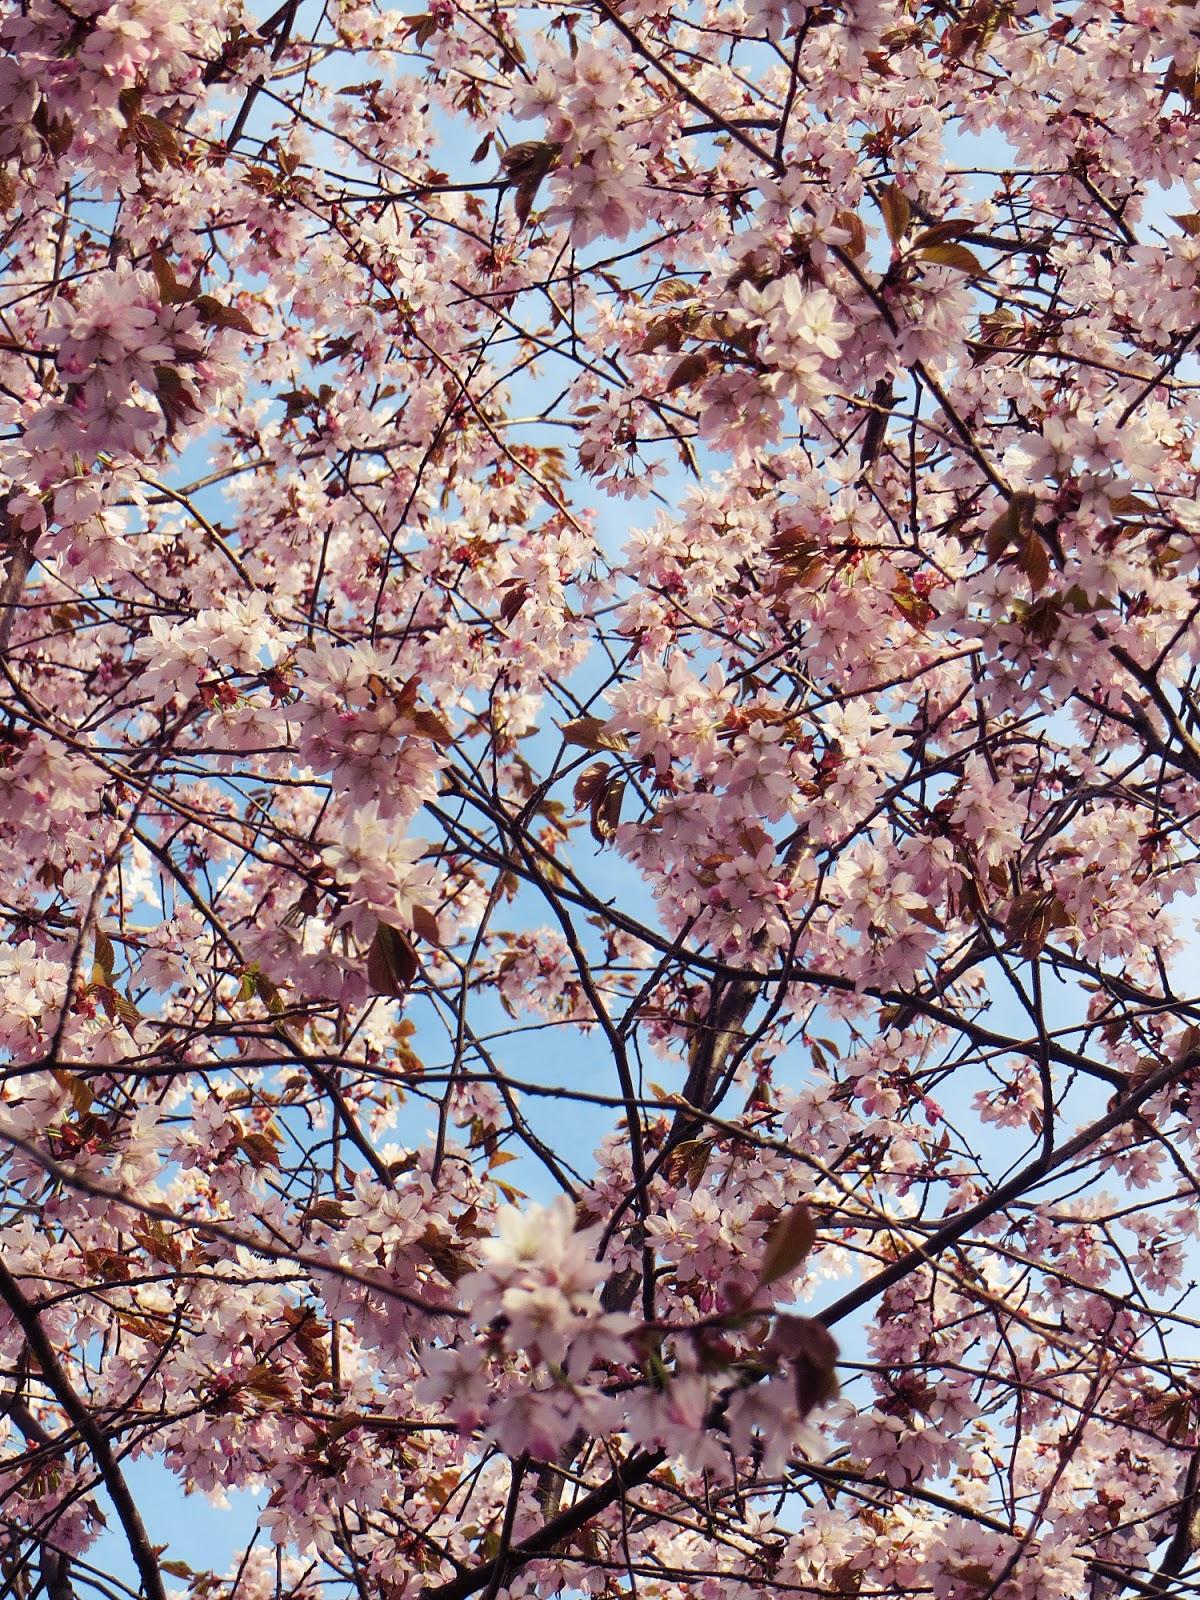 kirsikankukkia, kirsikankukat, cherry blossom, cherry blossoms, cherry blossom tree